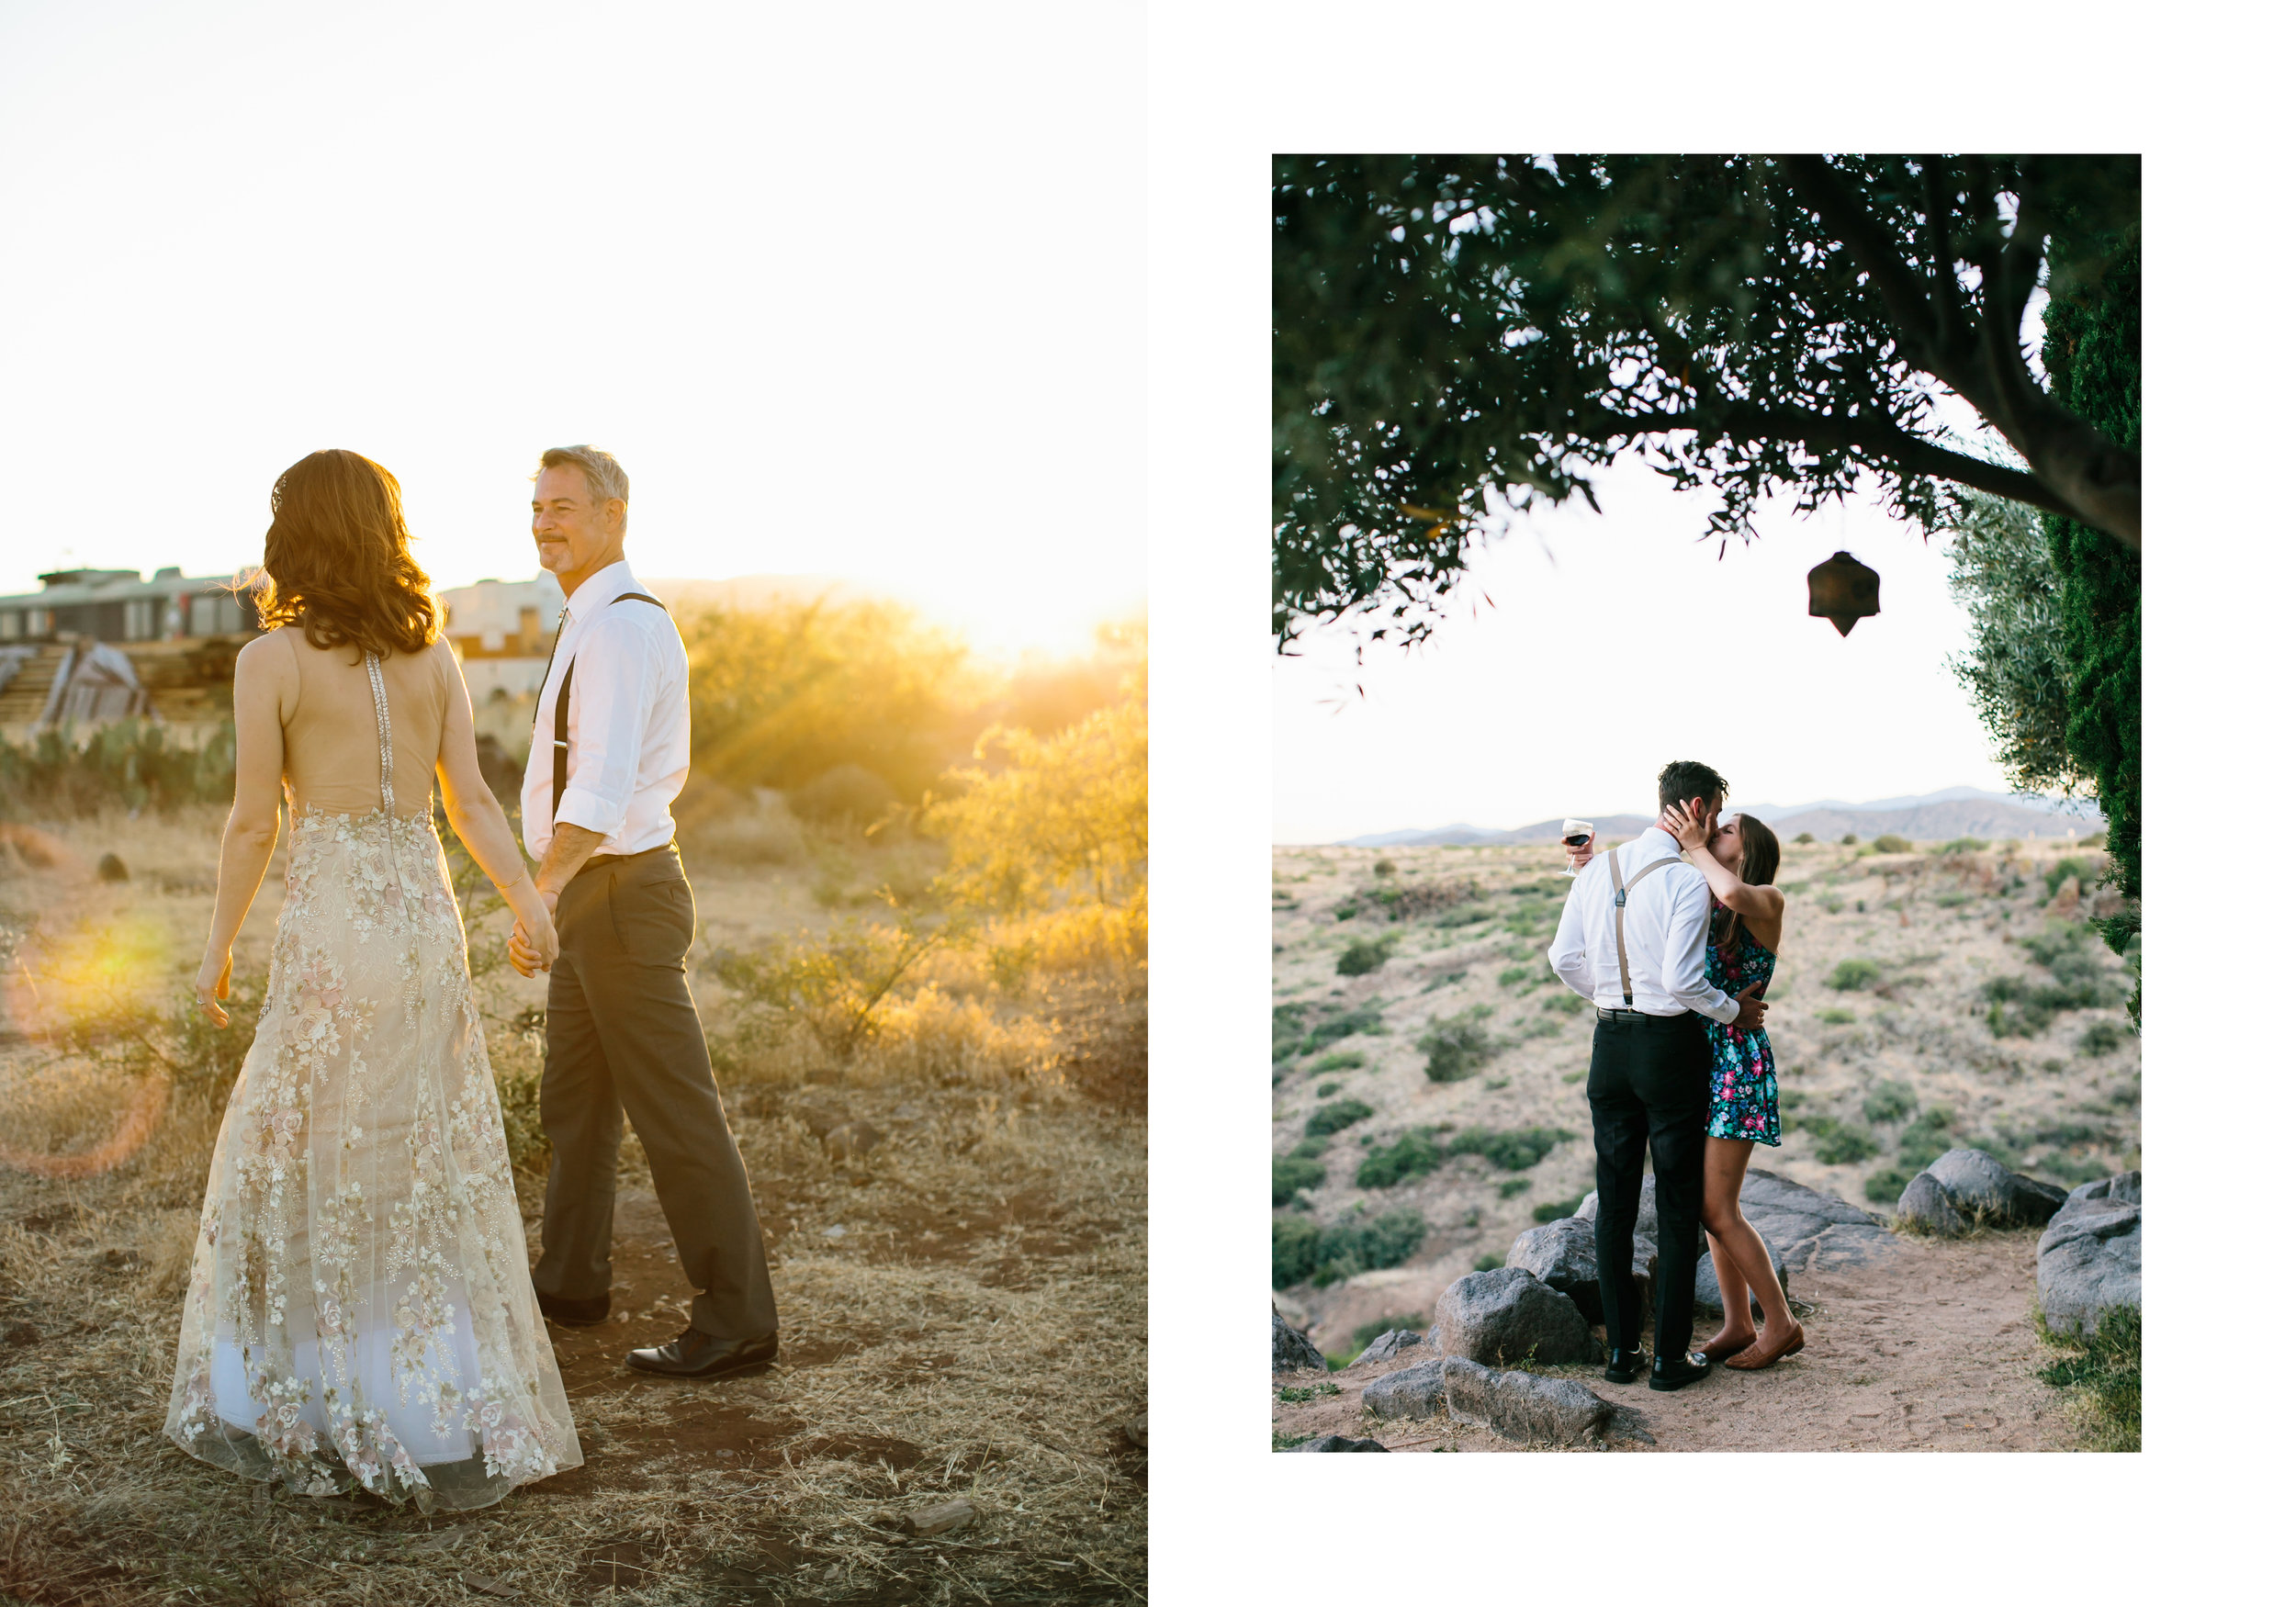 arcosanti-wedding-photography0035.JPG